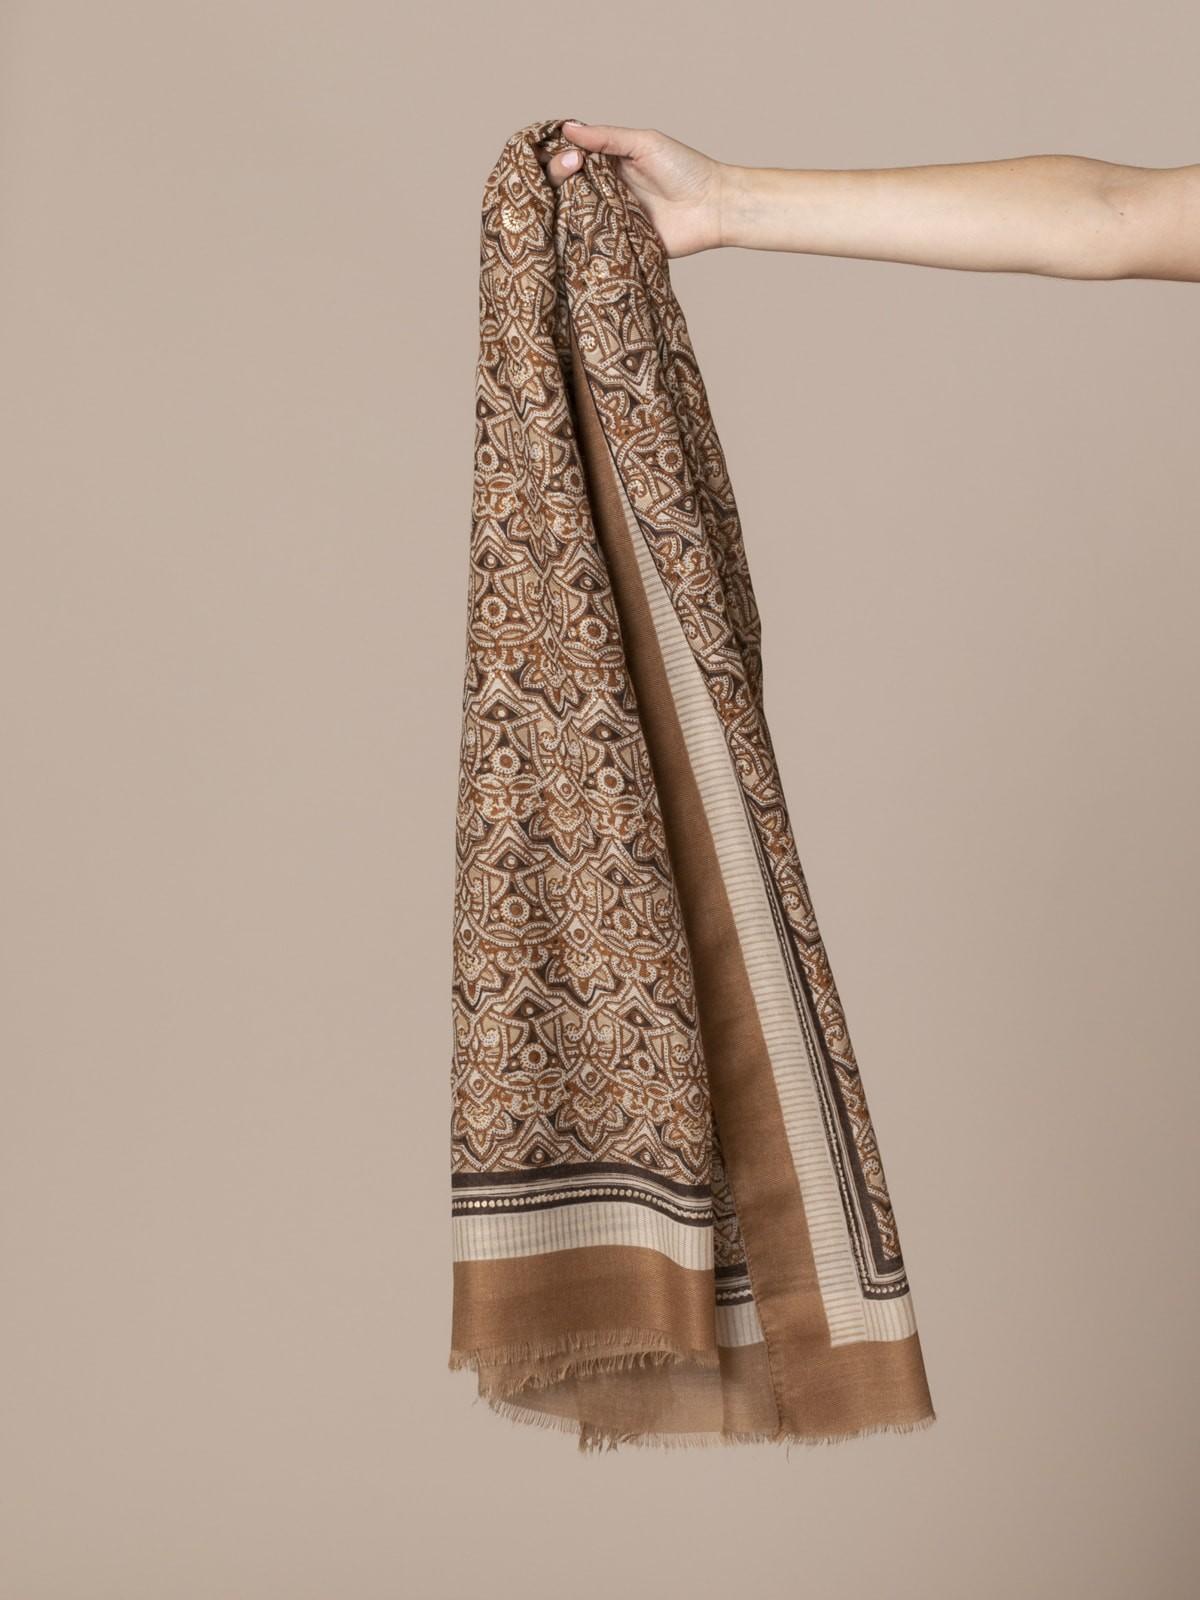 Woman Handkerchief Camel